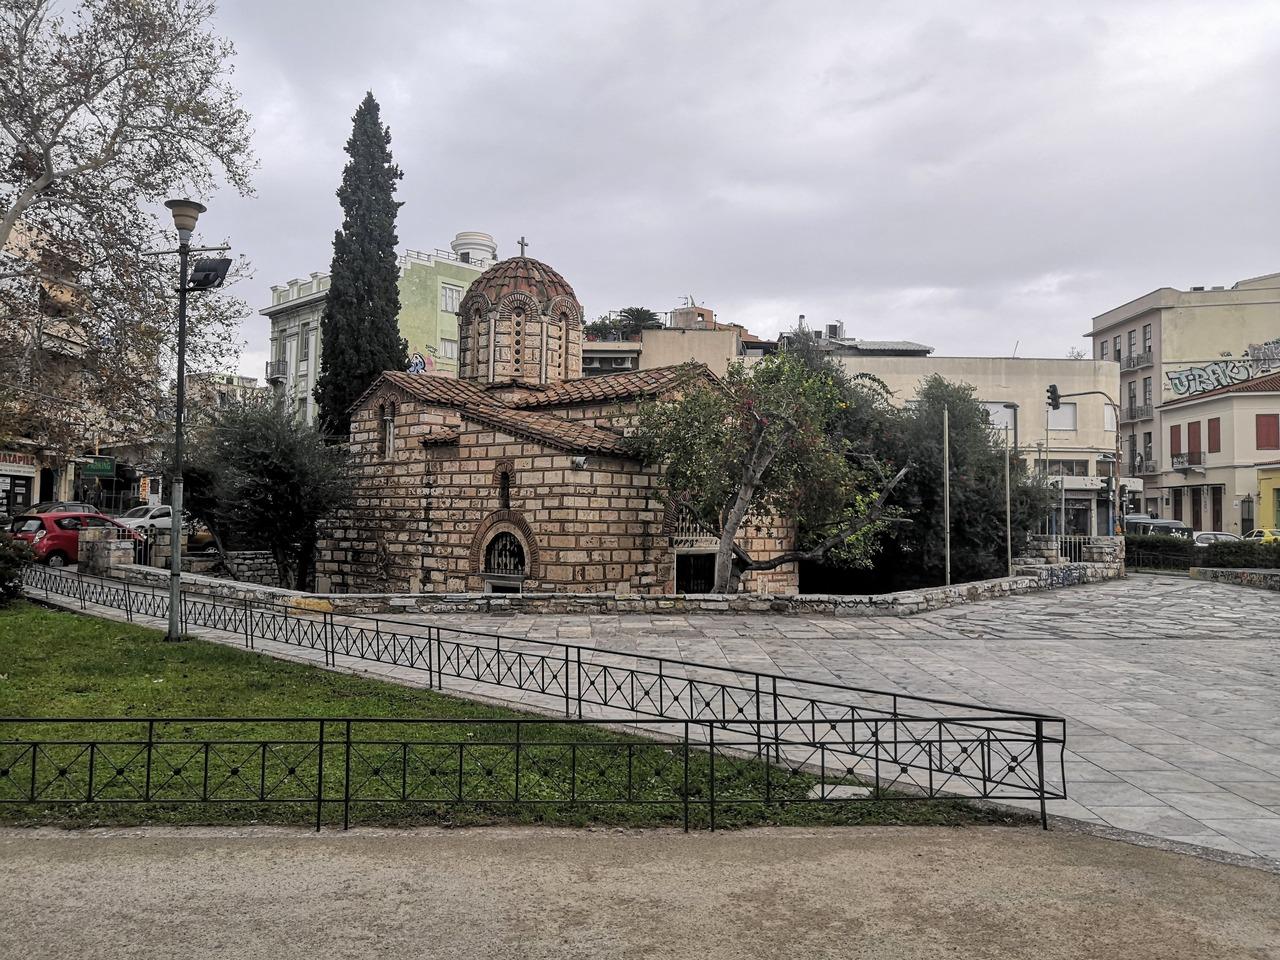 Urban churchyard on a square